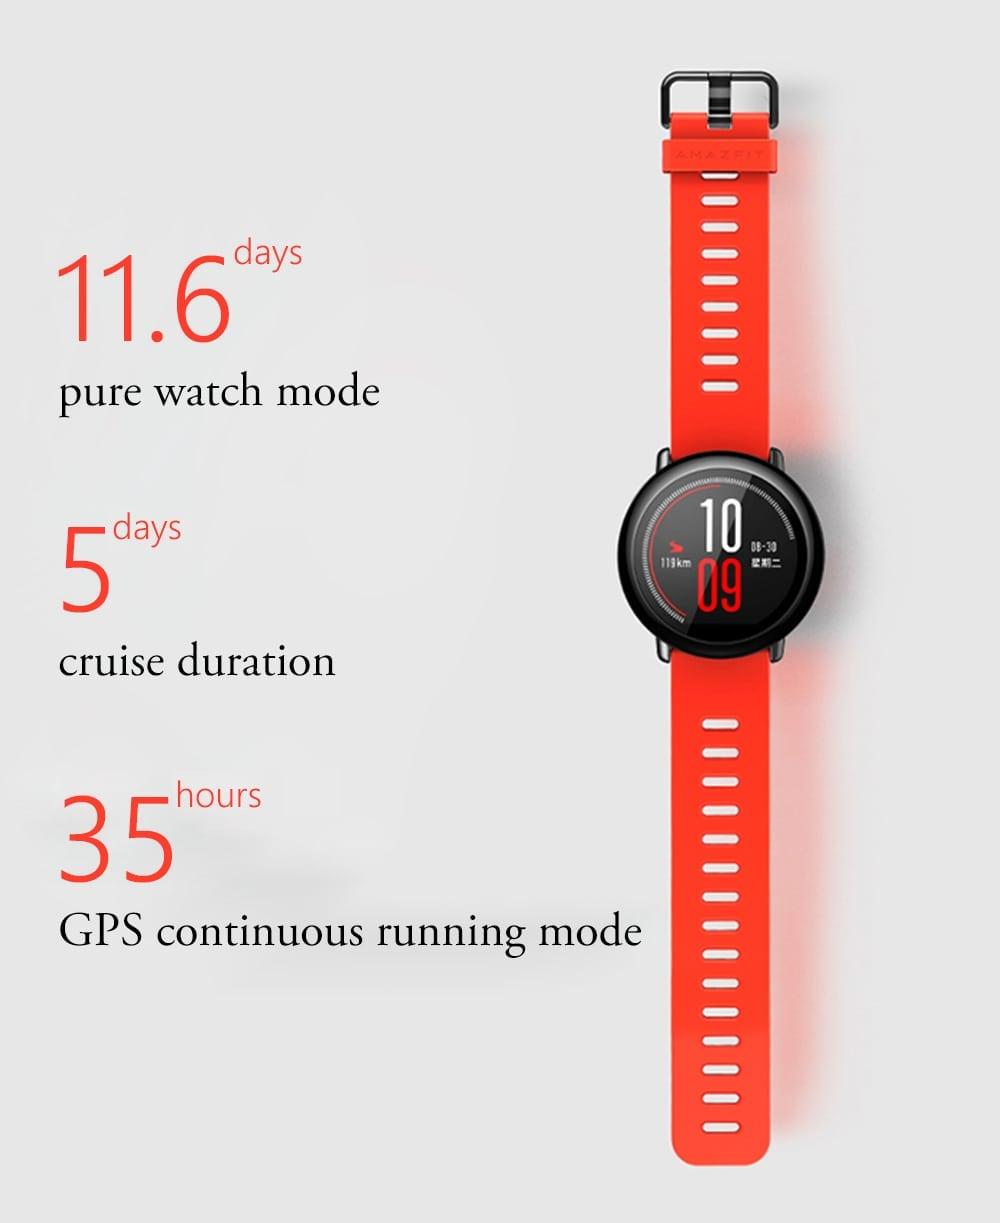 xiaomi amazfit smartwatch battery life